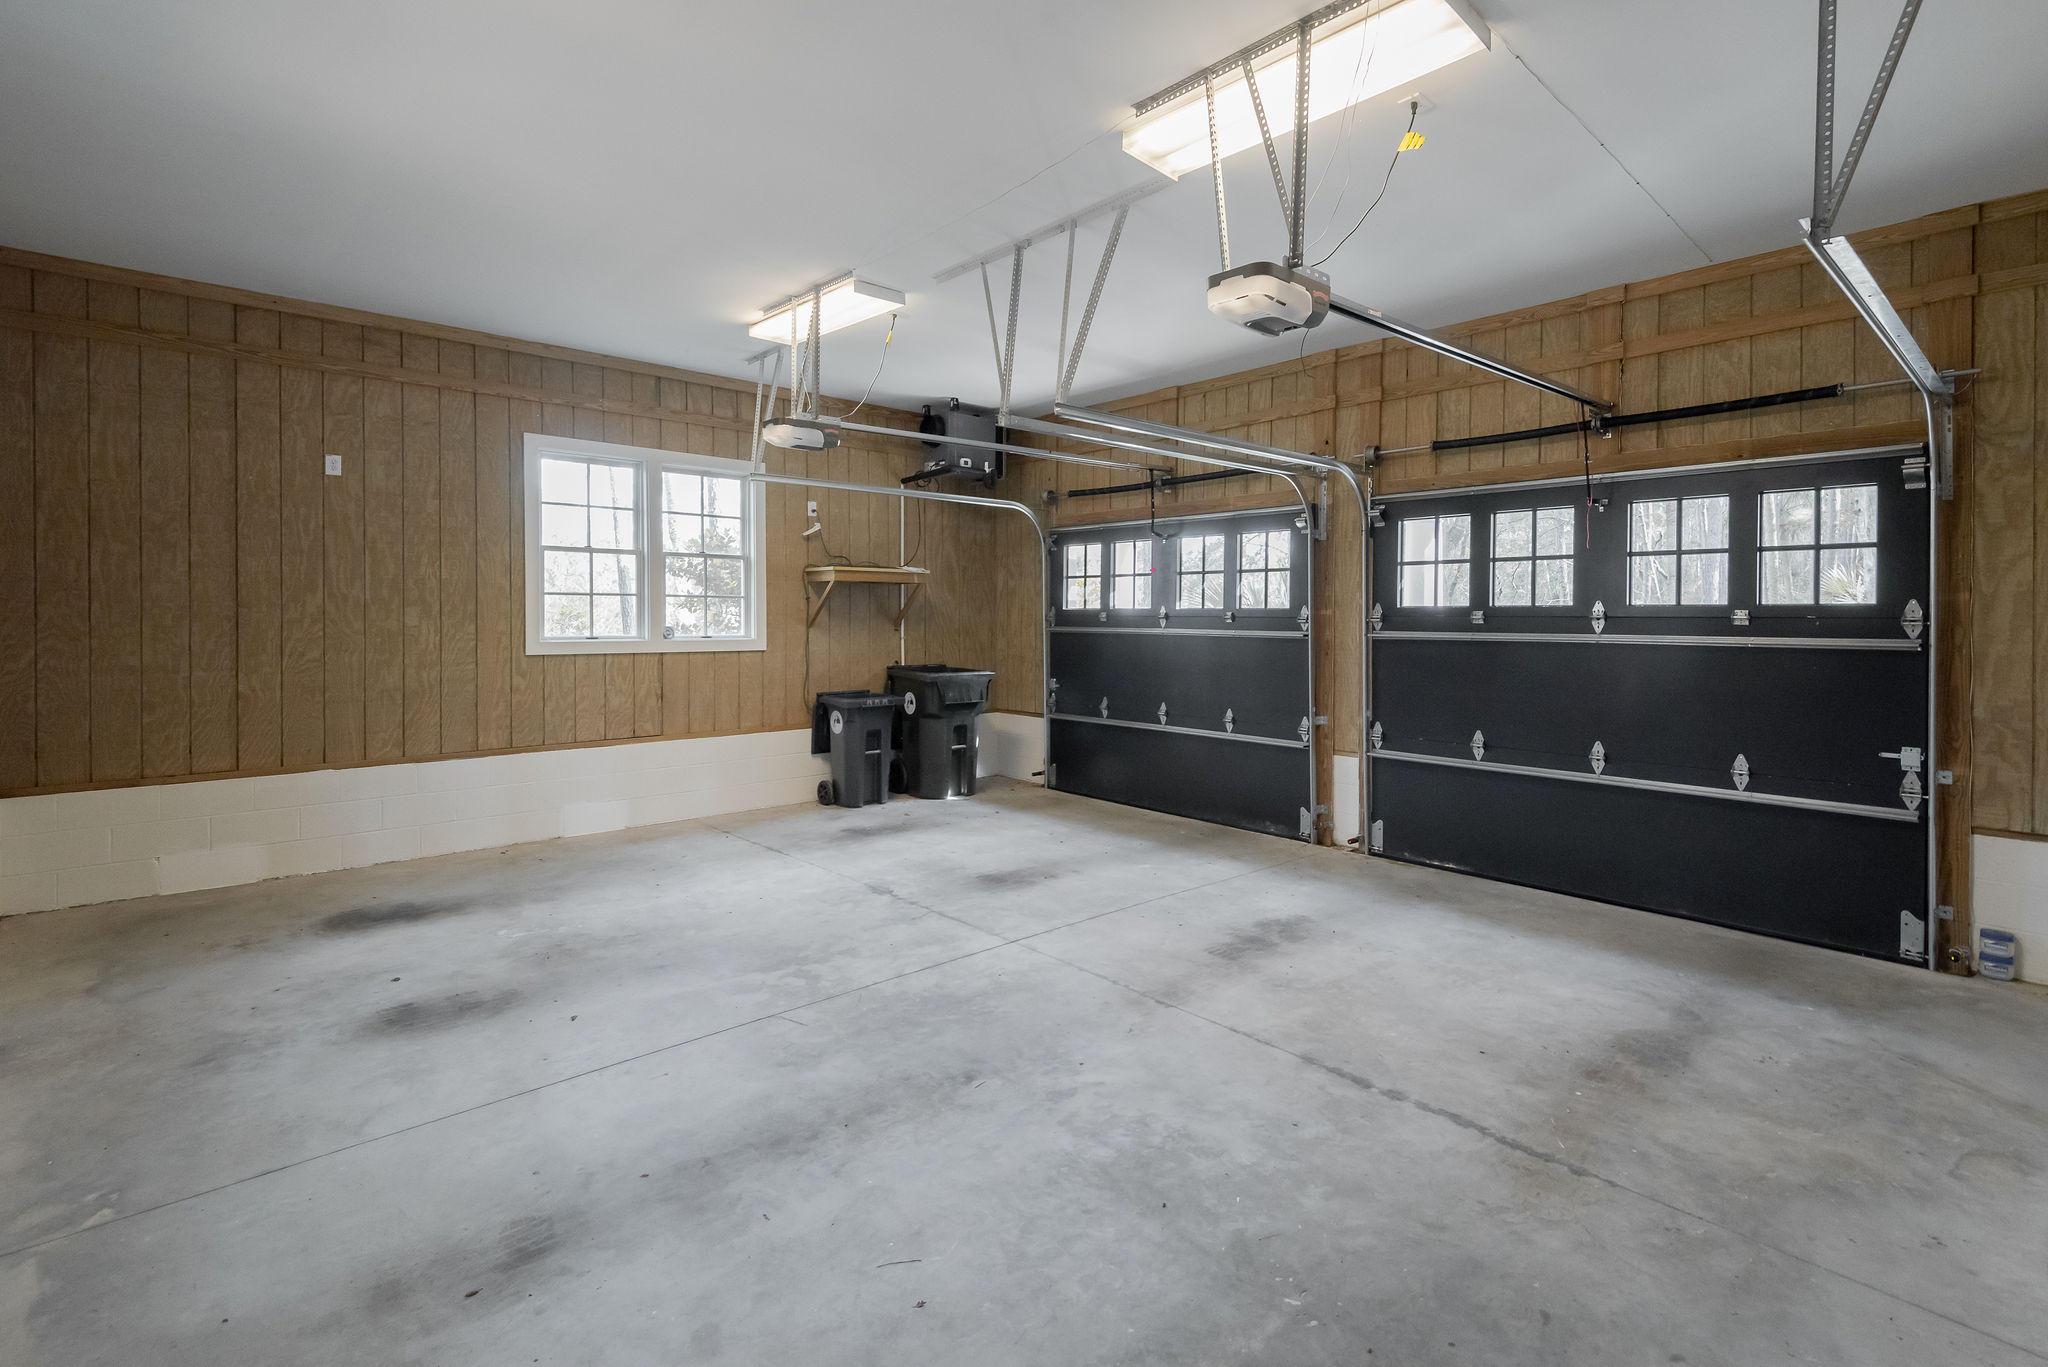 Kiawah Island Homes For Sale - 3 Grey Widgeon, Kiawah Island, SC - 38